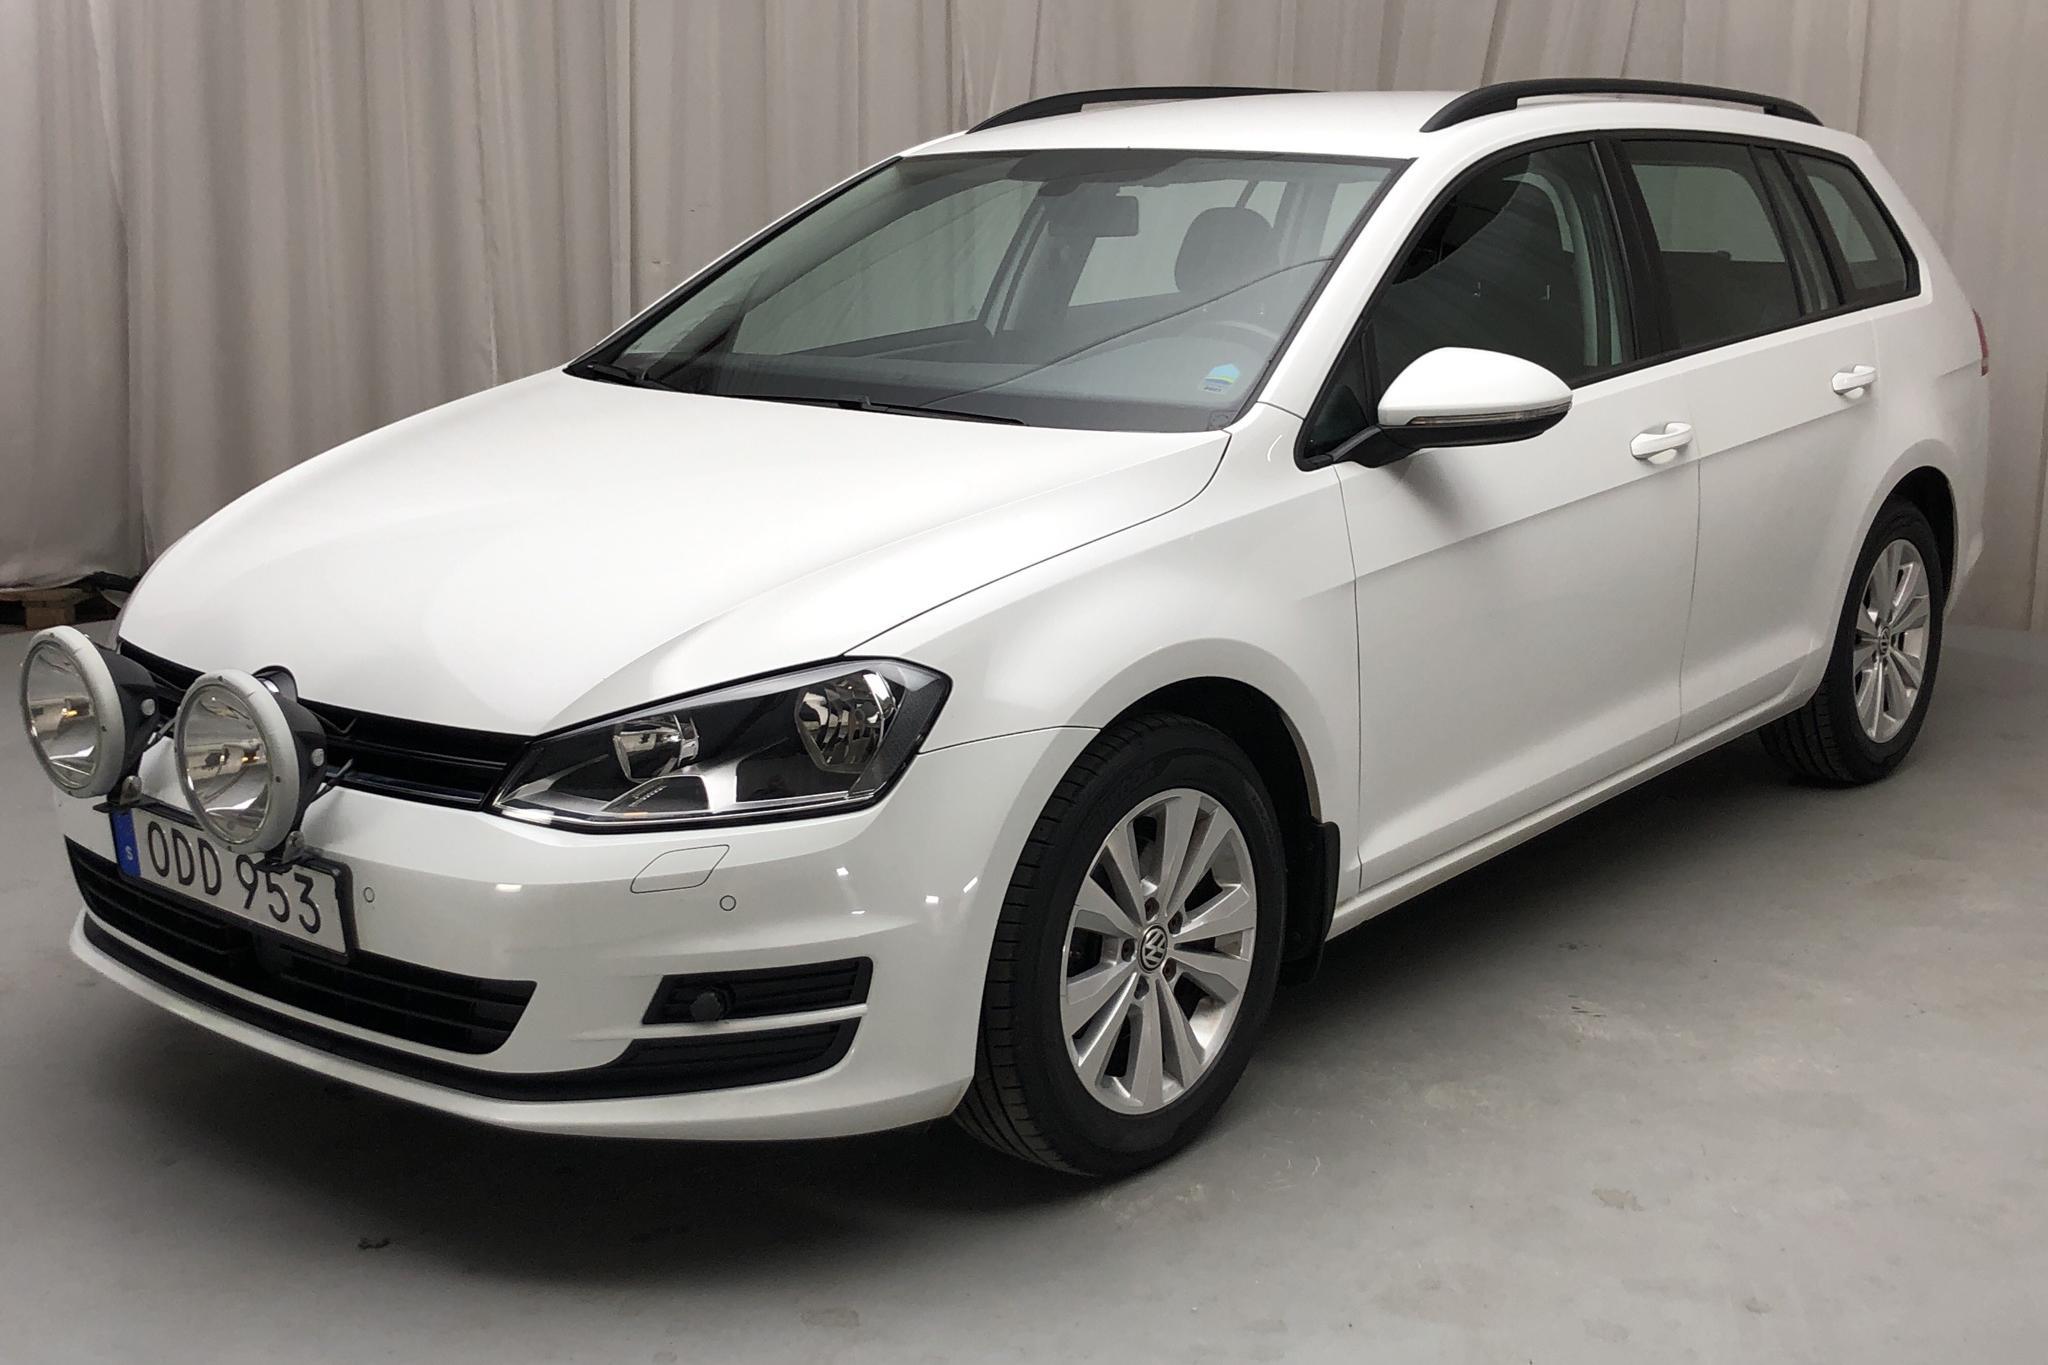 VW Golf VII 1.6 TDI BlueMotion Sportscombi 4Motion (110hk) - 15 956 mil - Manuell - vit - 2017